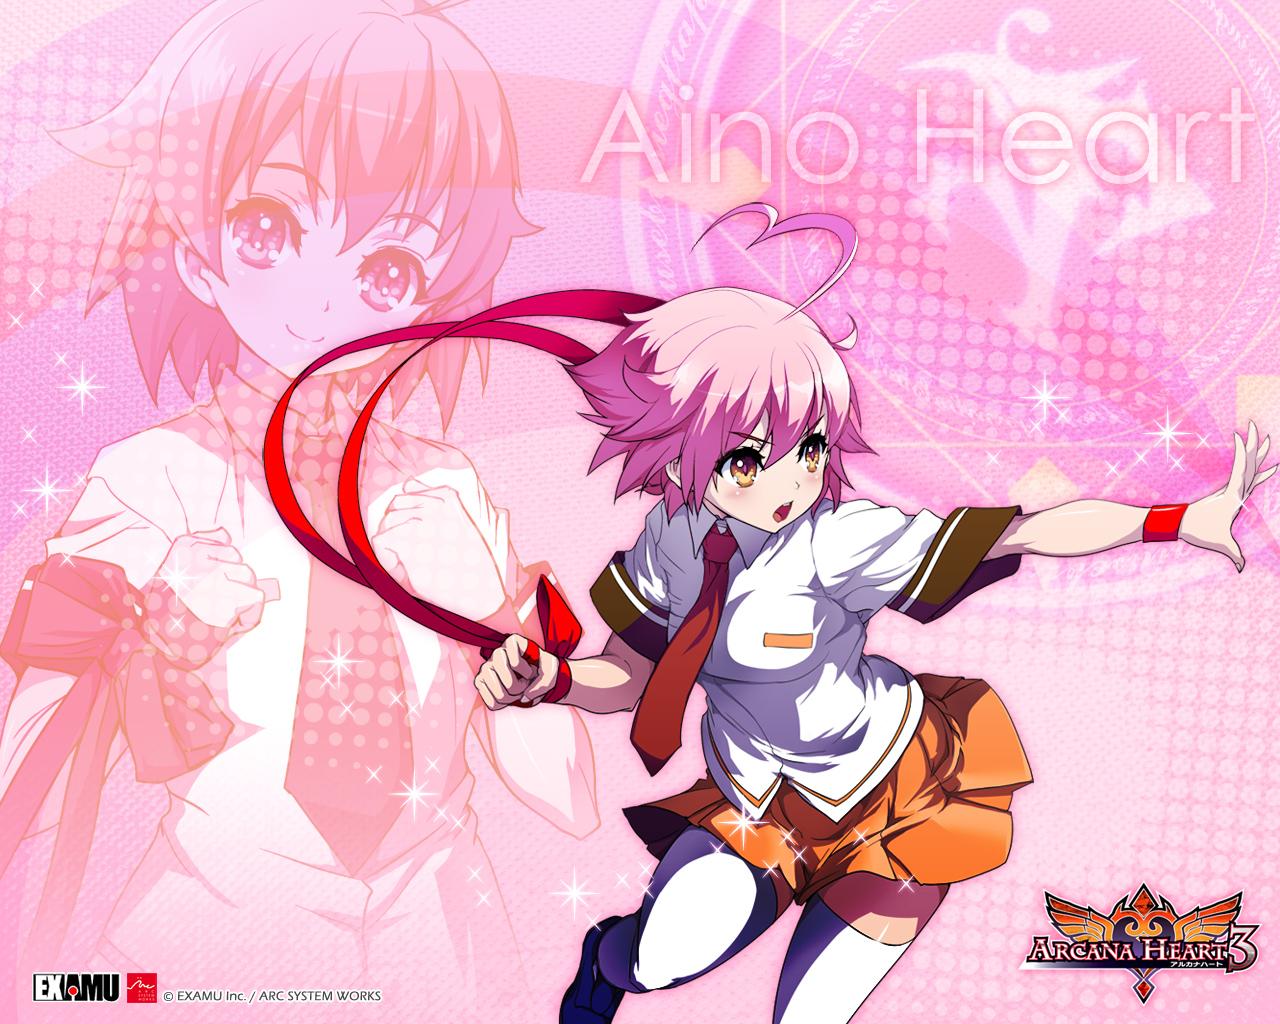 http://3.bp.blogspot.com/_XL7DNILu0Po/TQN4NloBOOI/AAAAAAAADgQ/1JLYYKMTMCg/s1600/wp_heart_1280x1024.jpg